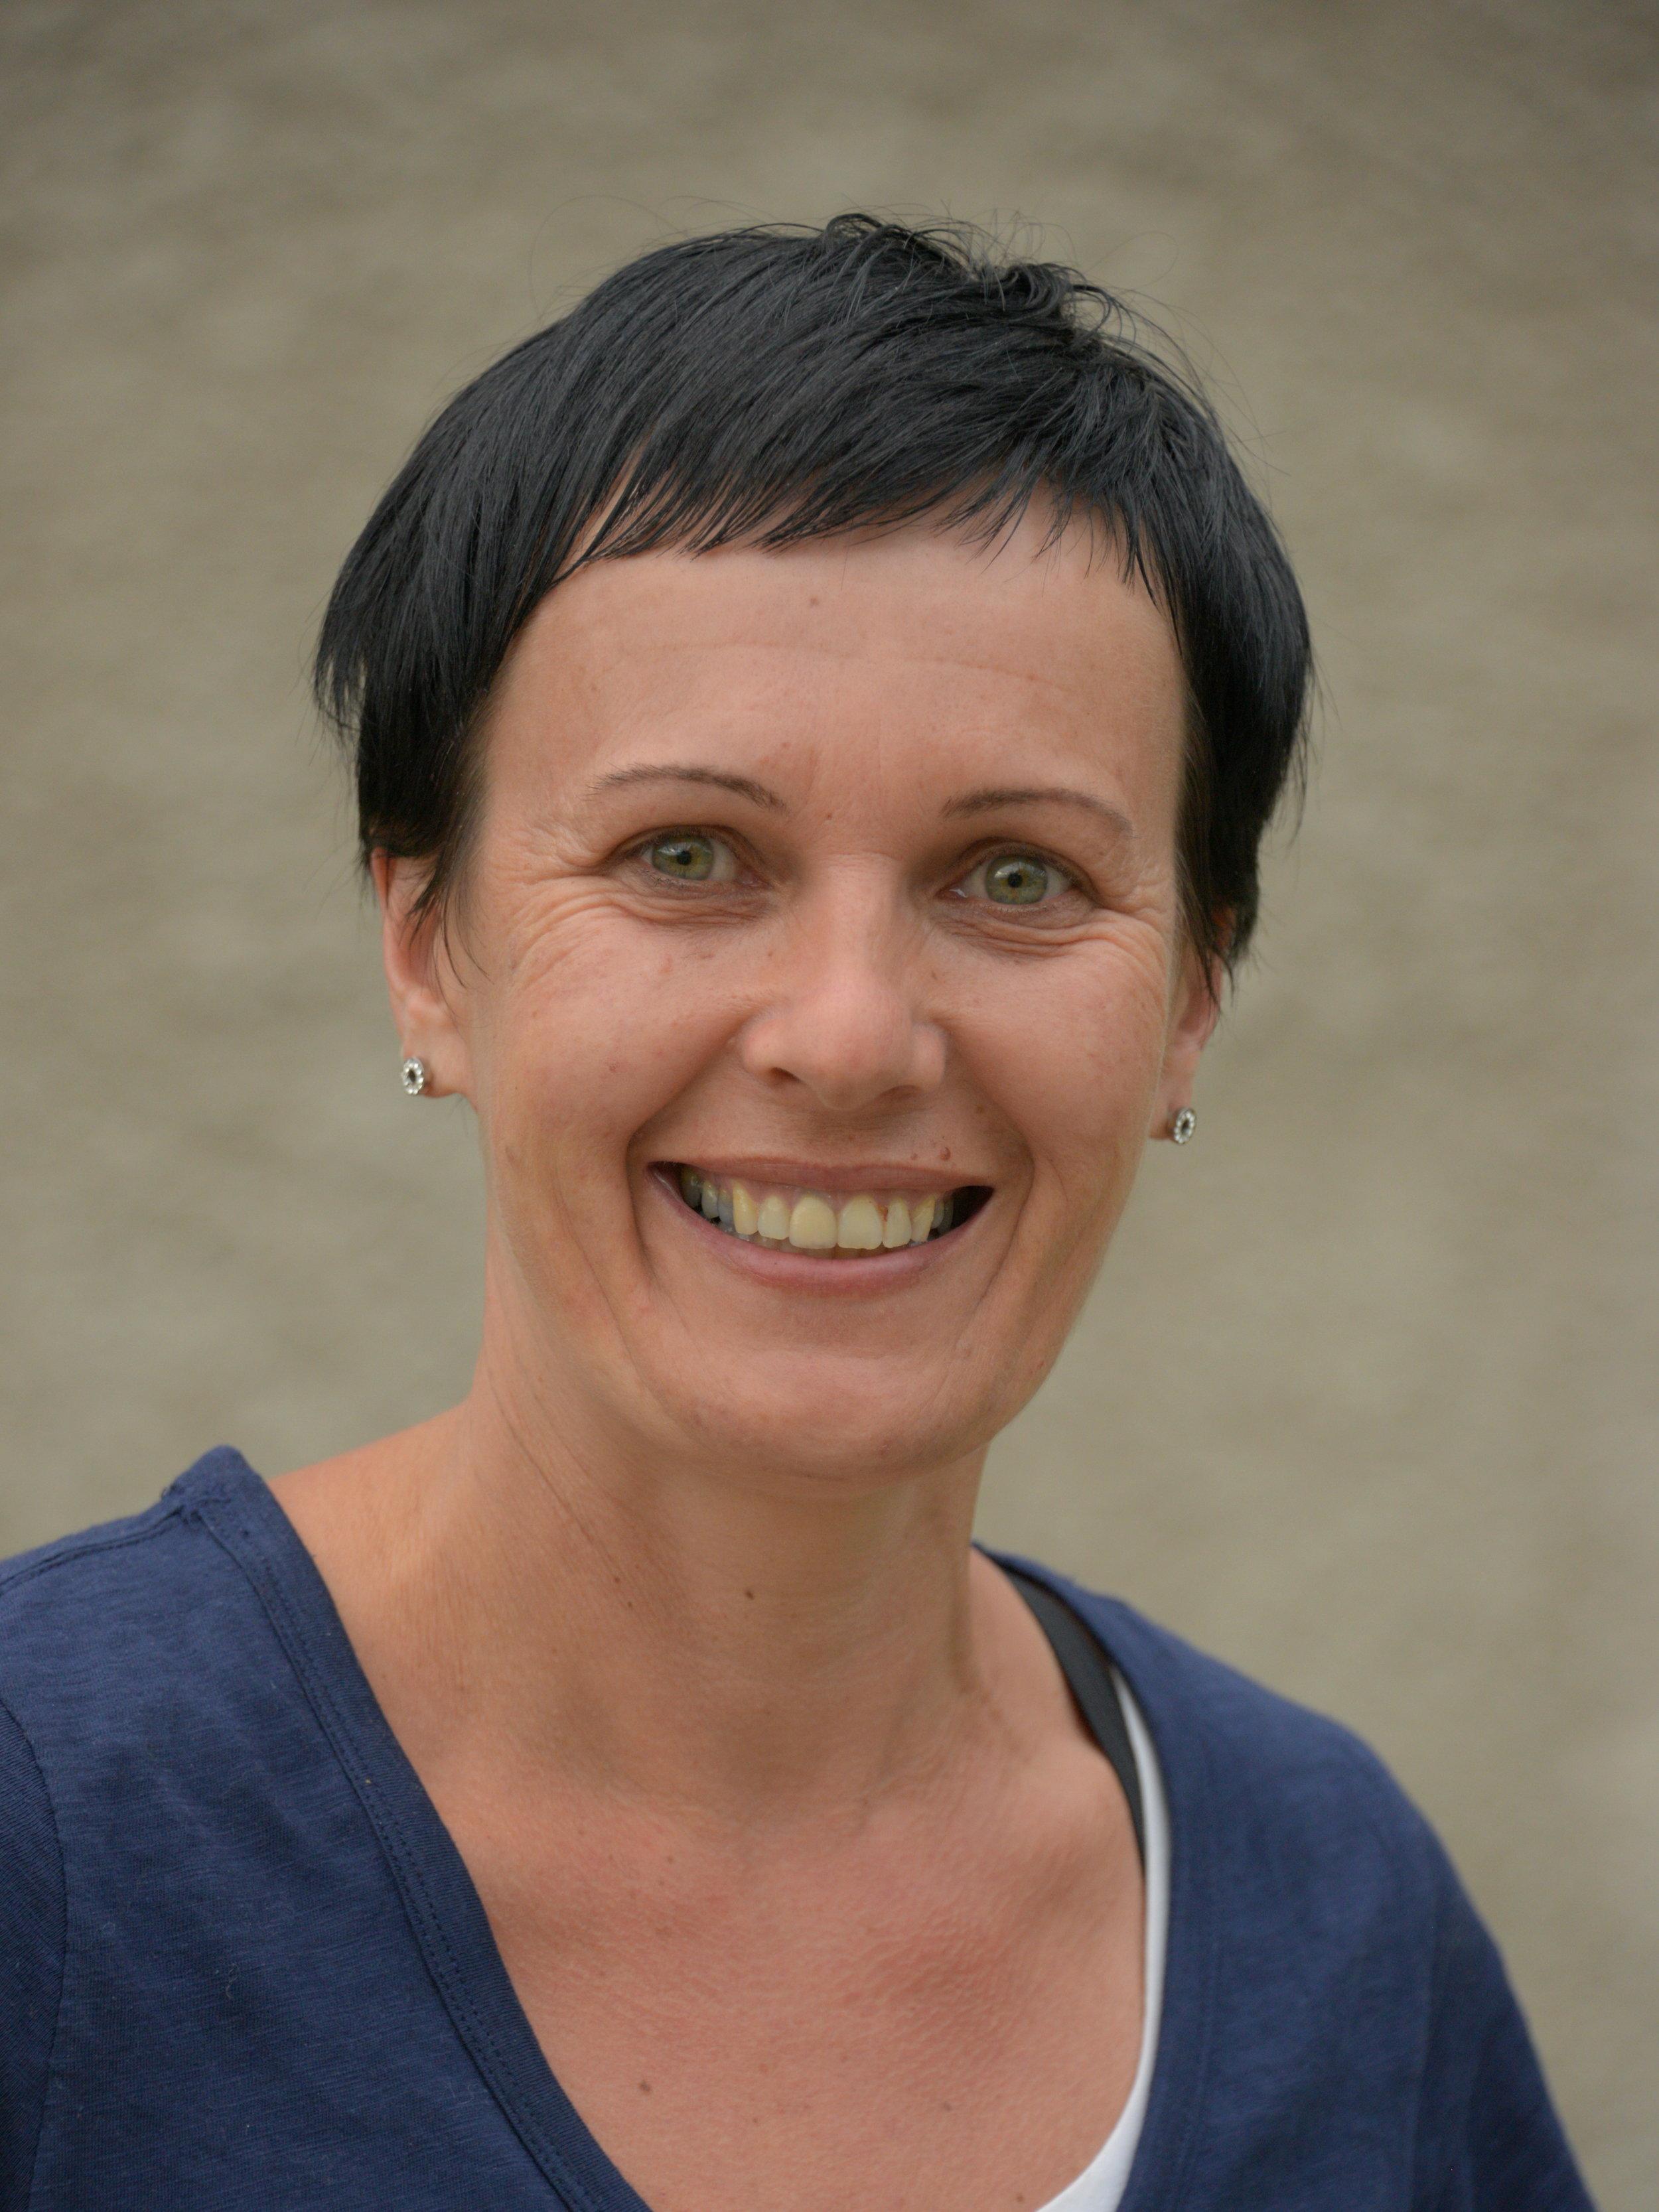 Isolde Ecklbauer